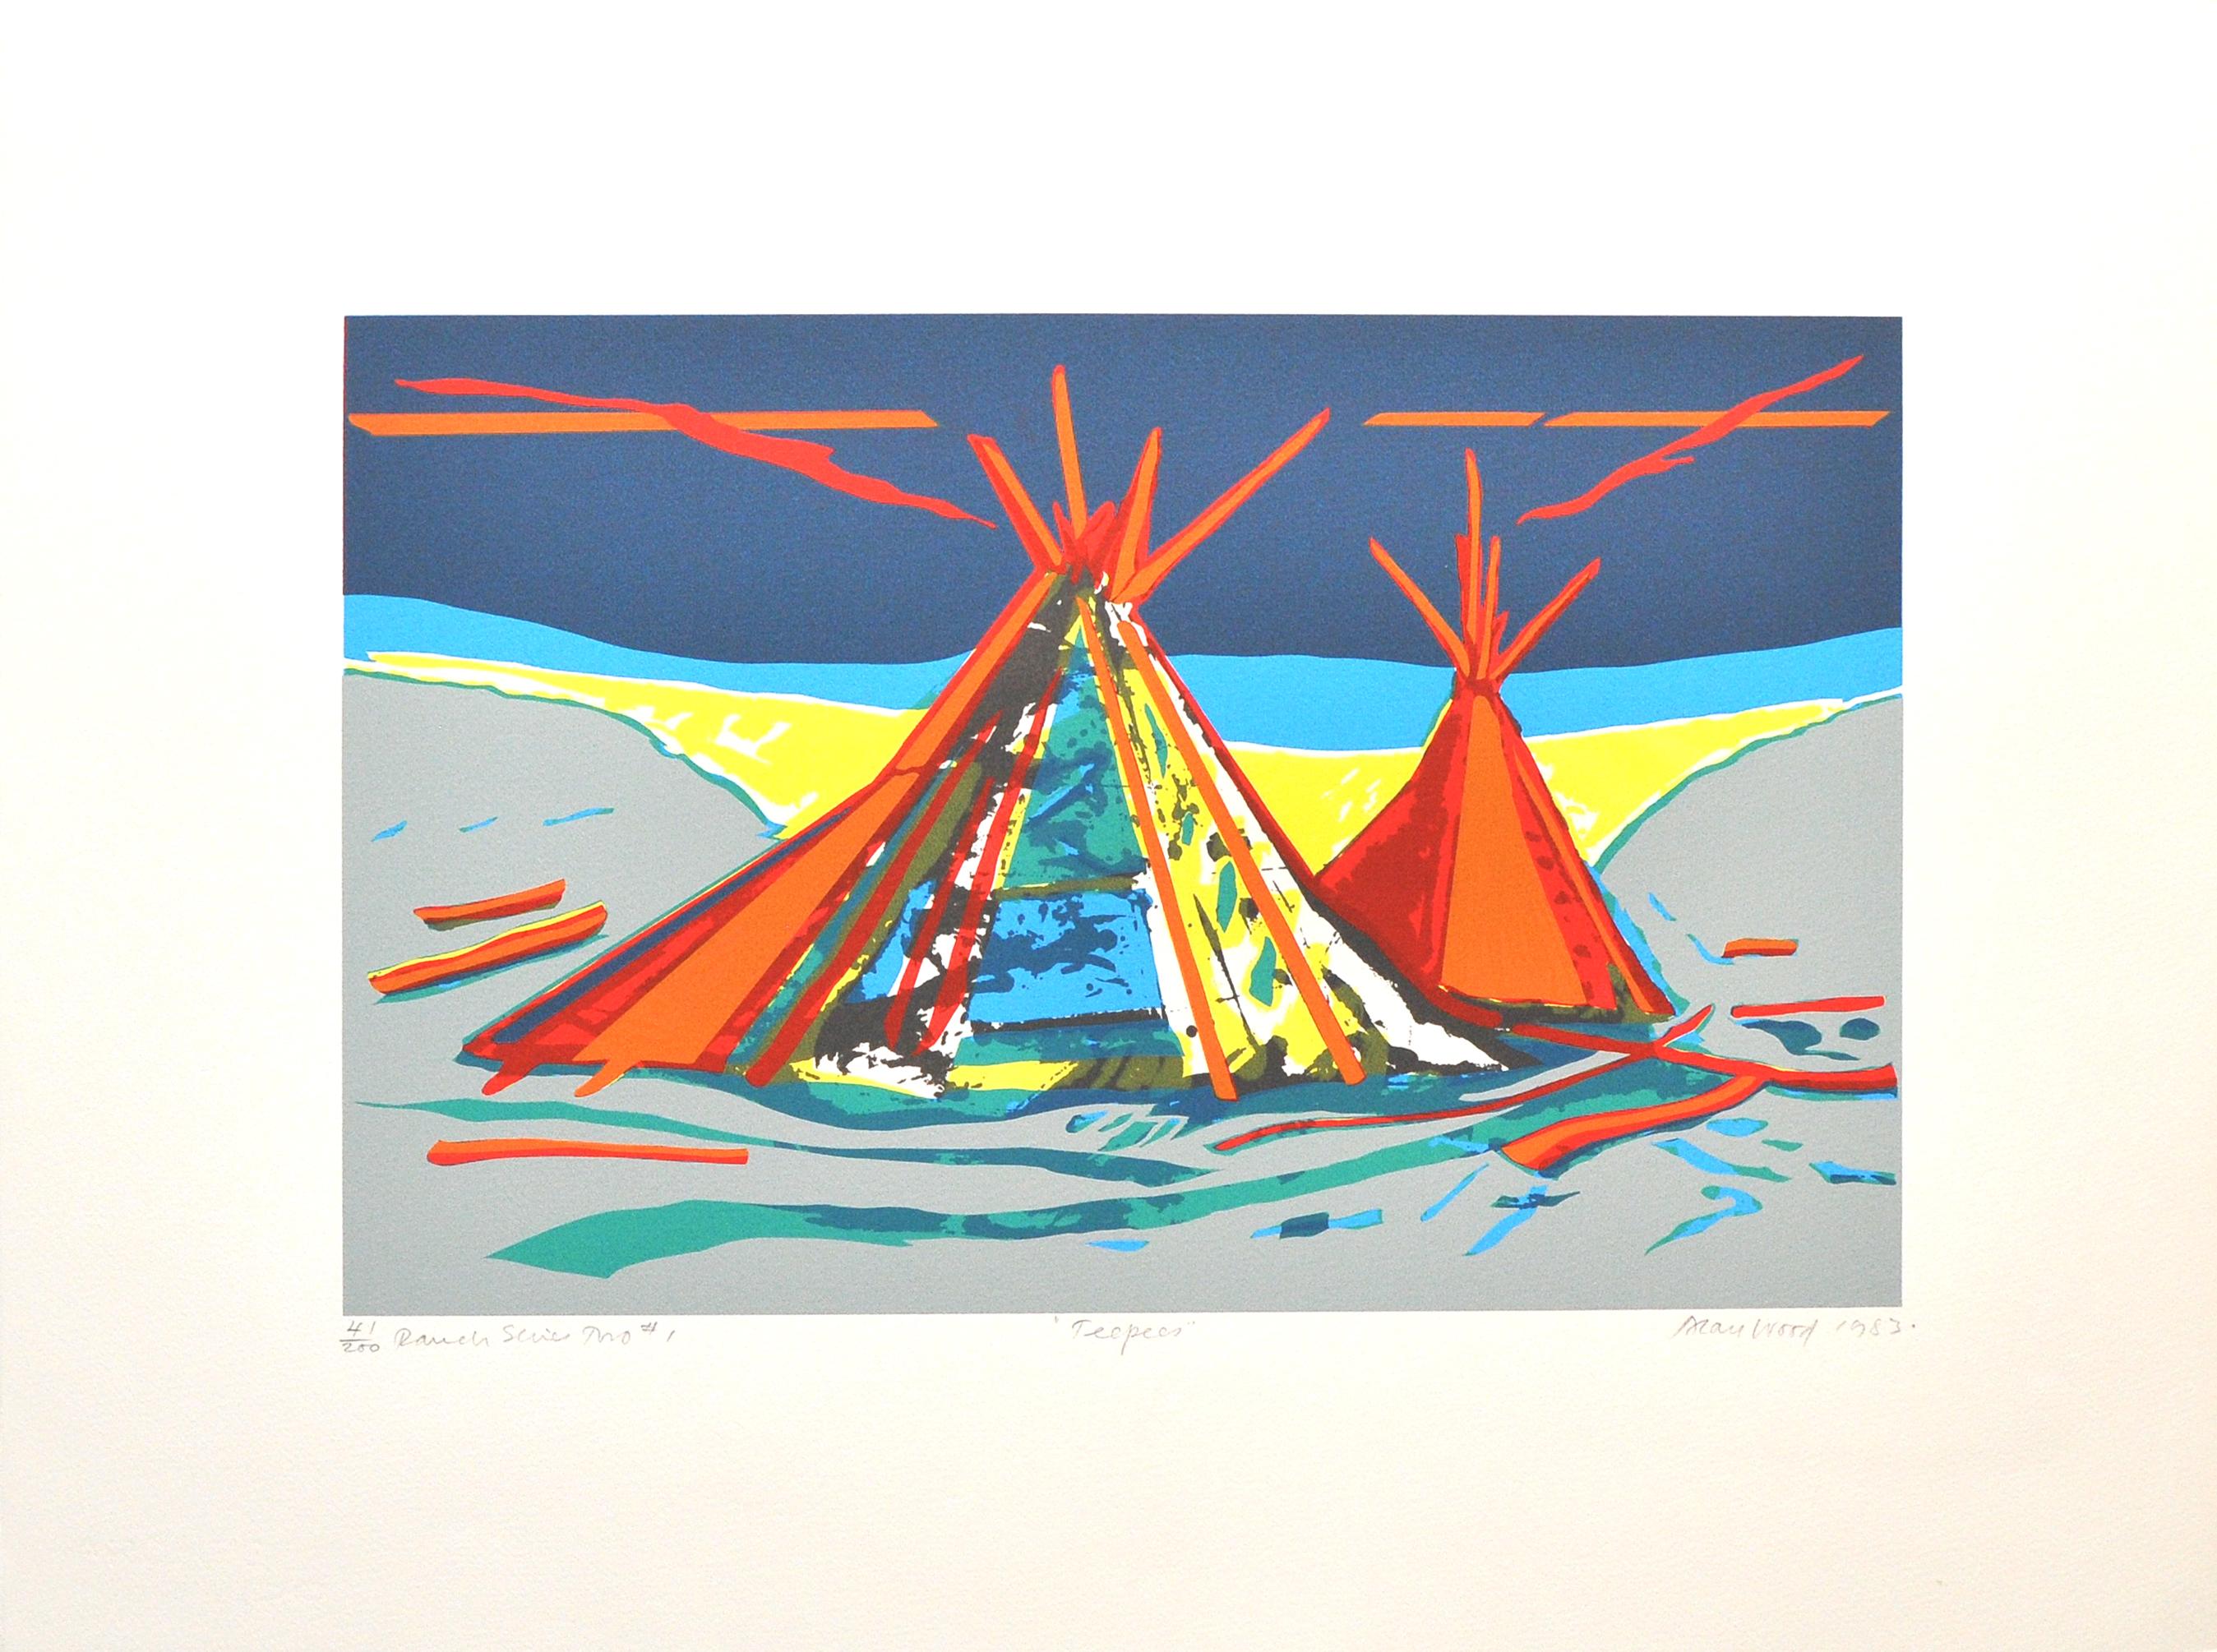 Alan_Woods_1983_Prints_#41_RanchSeriesTwo#1_Teepees